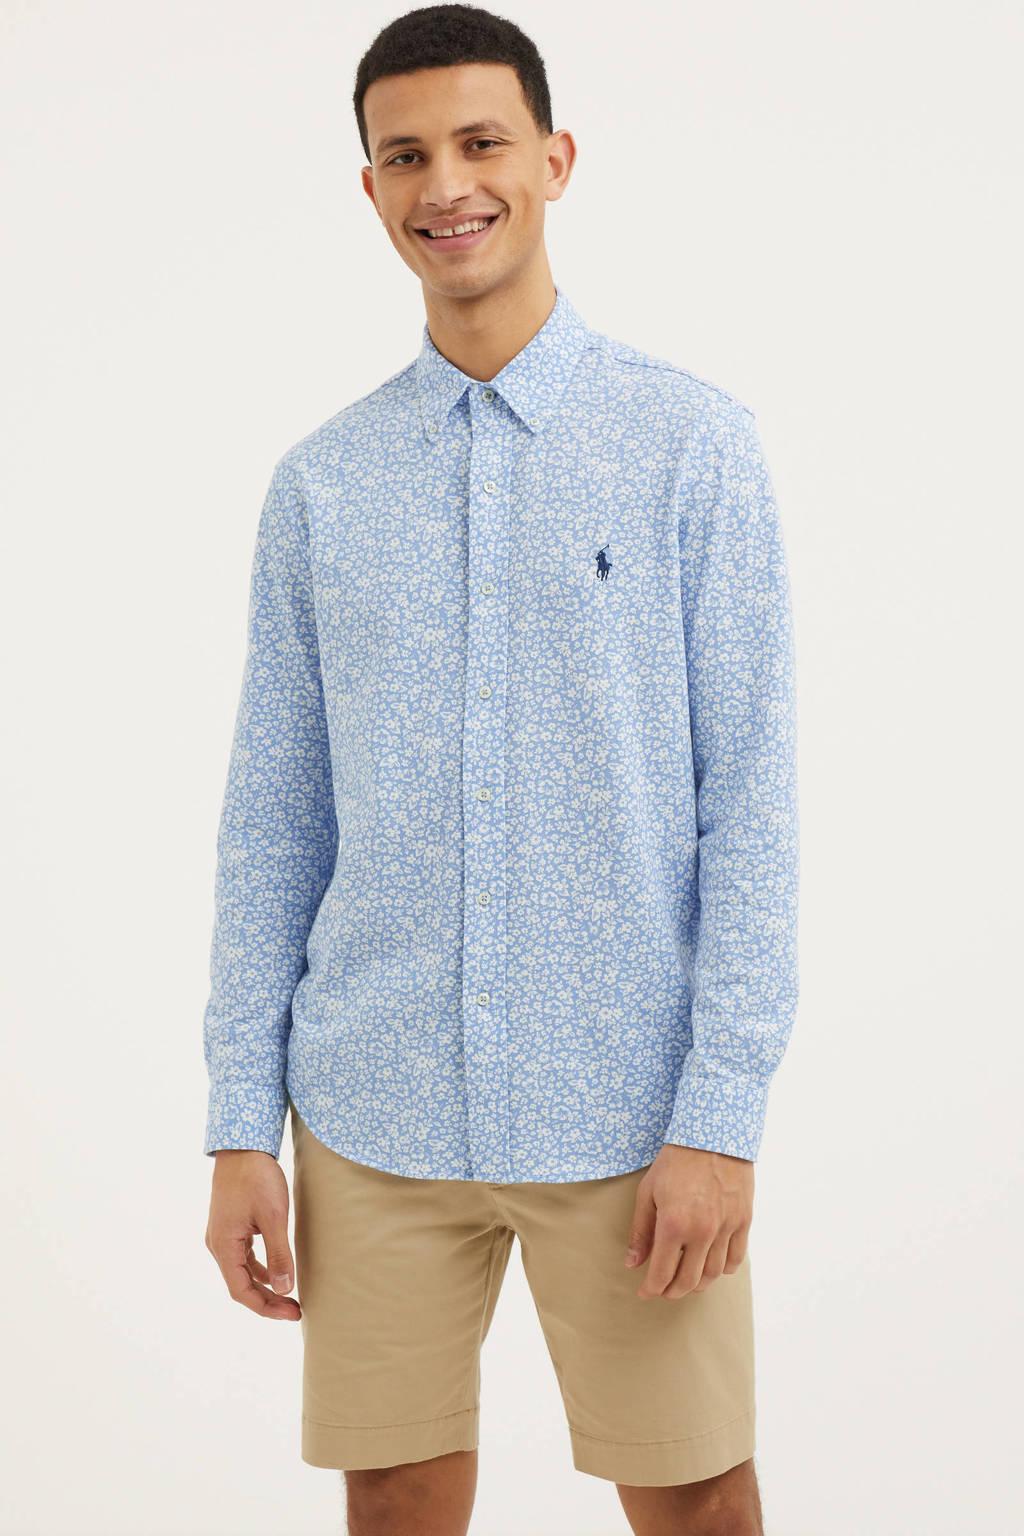 POLO Ralph Lauren regular fit overhemd met all over print lichtblauw/wit, Lichtblauw/wit